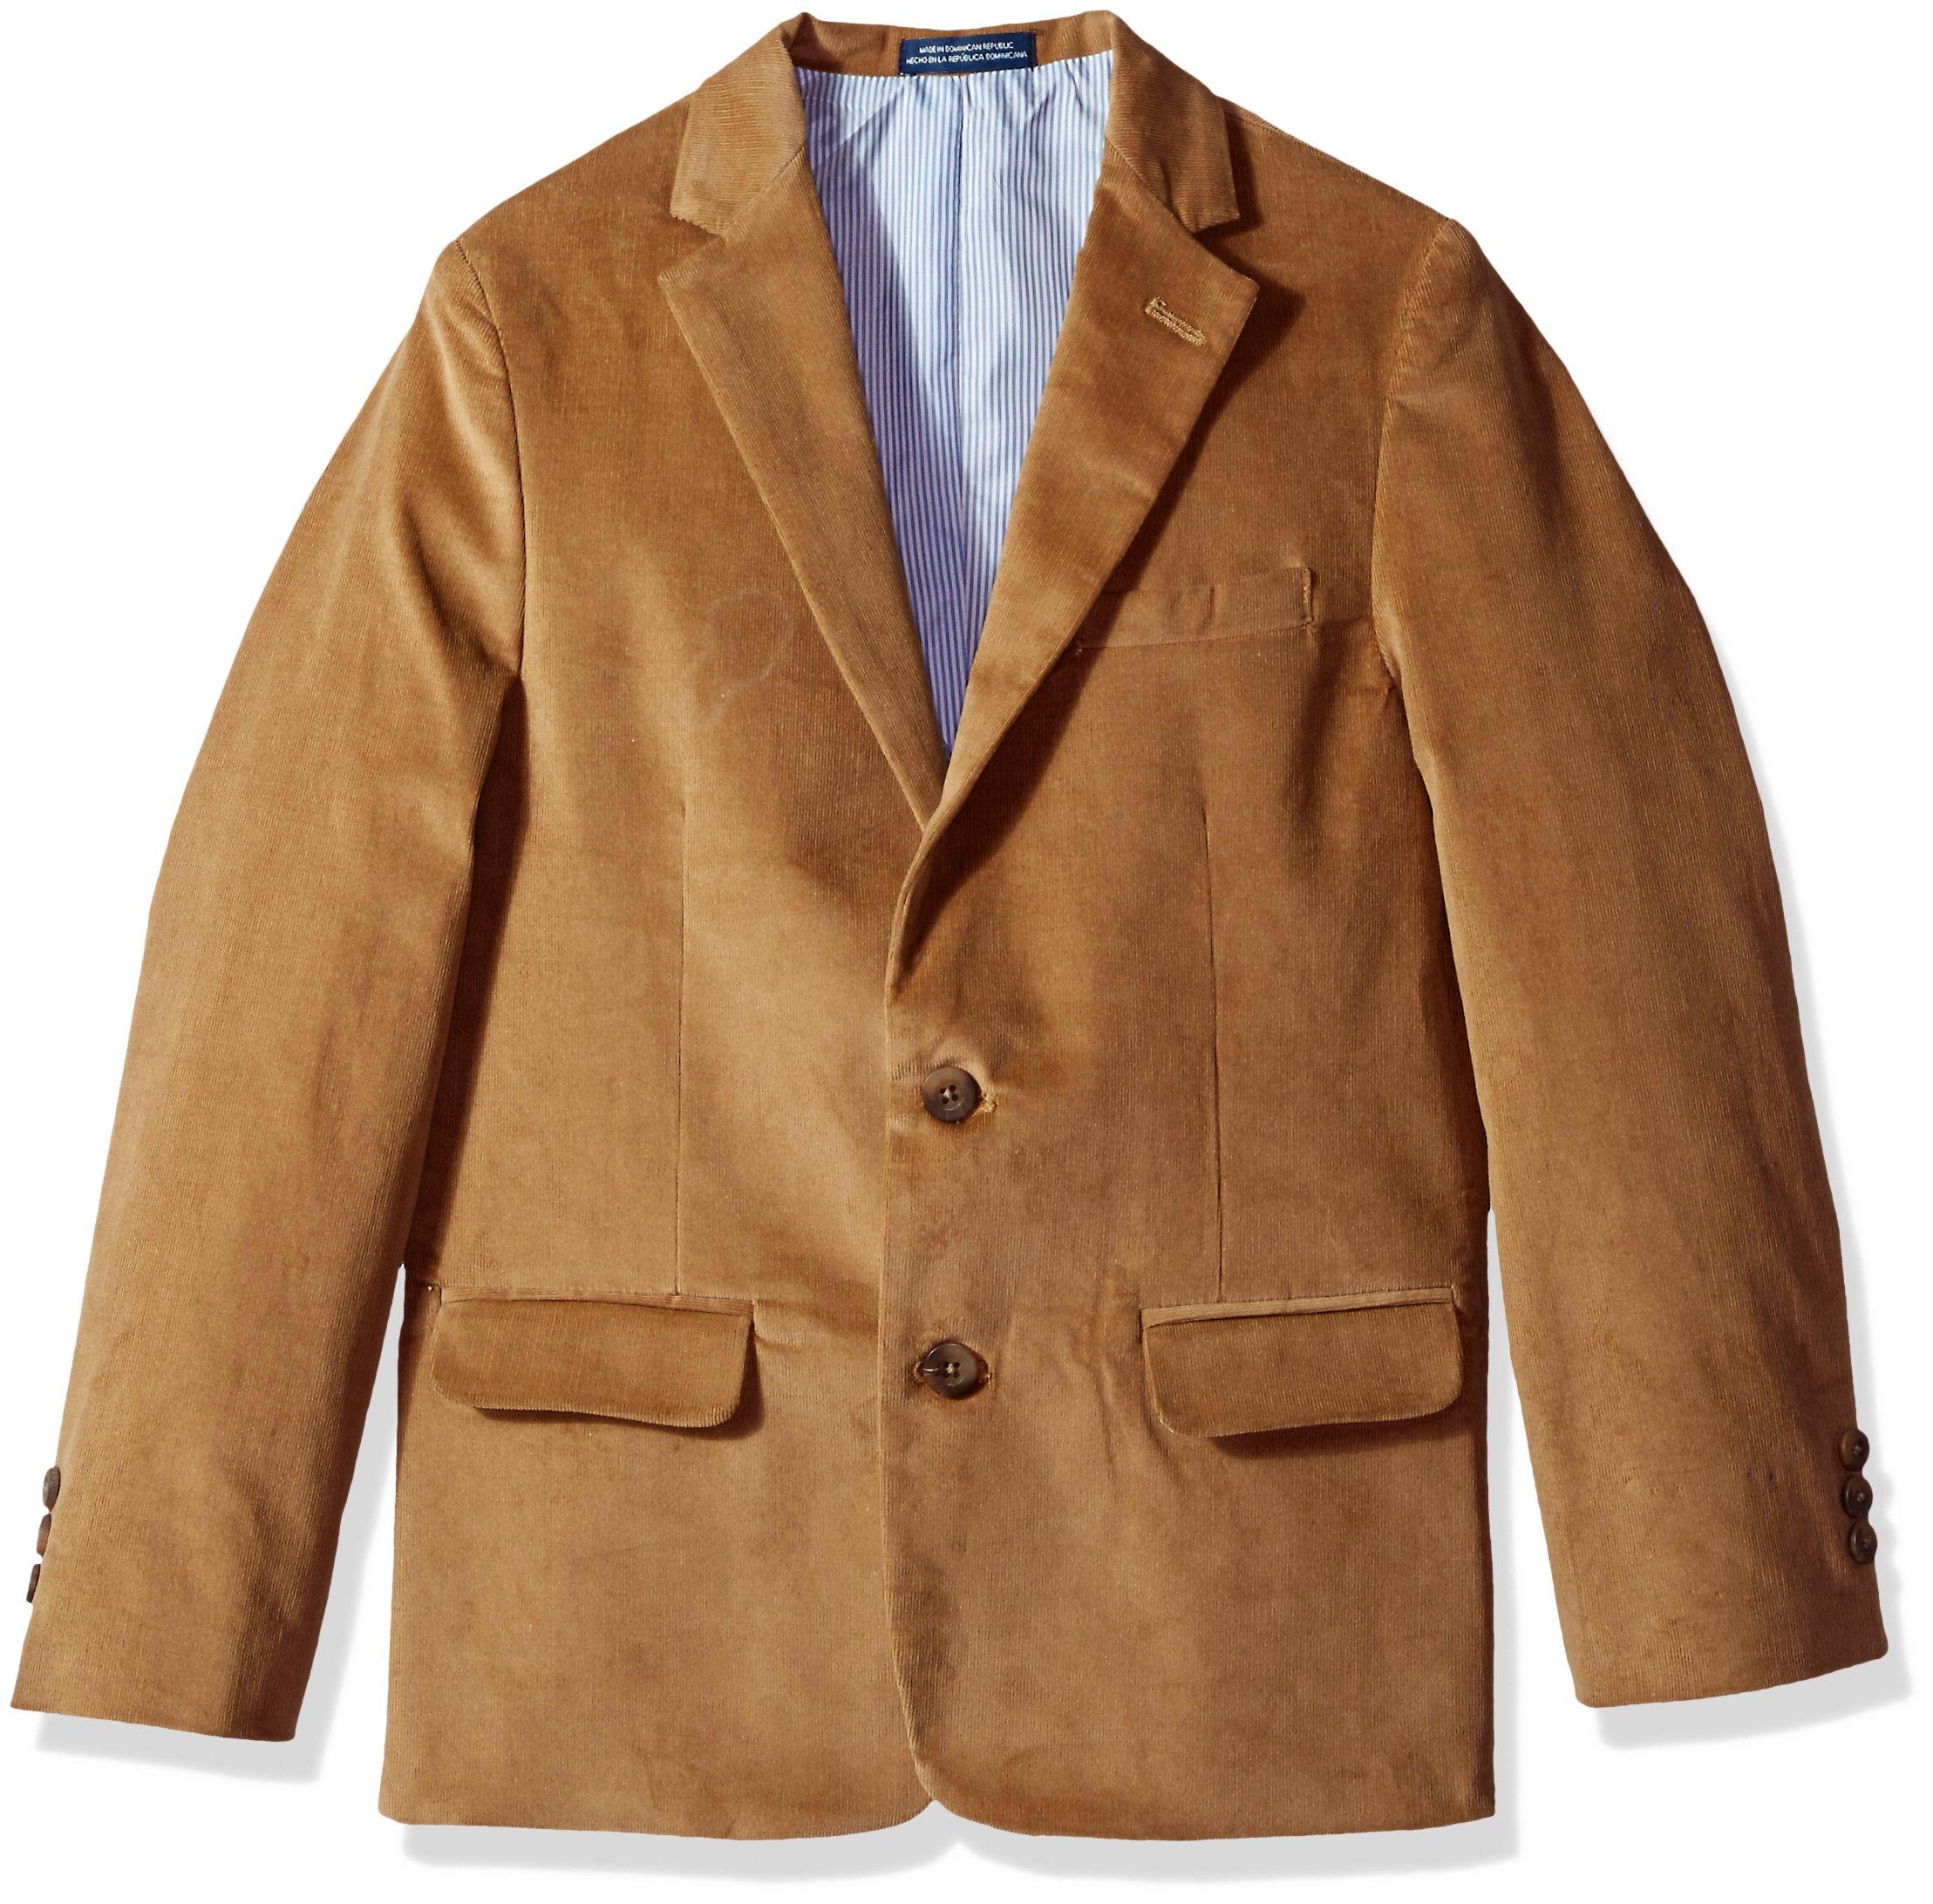 IZOD Big Boys' Blazer Suit Jacket, Brown Corduroy, 8